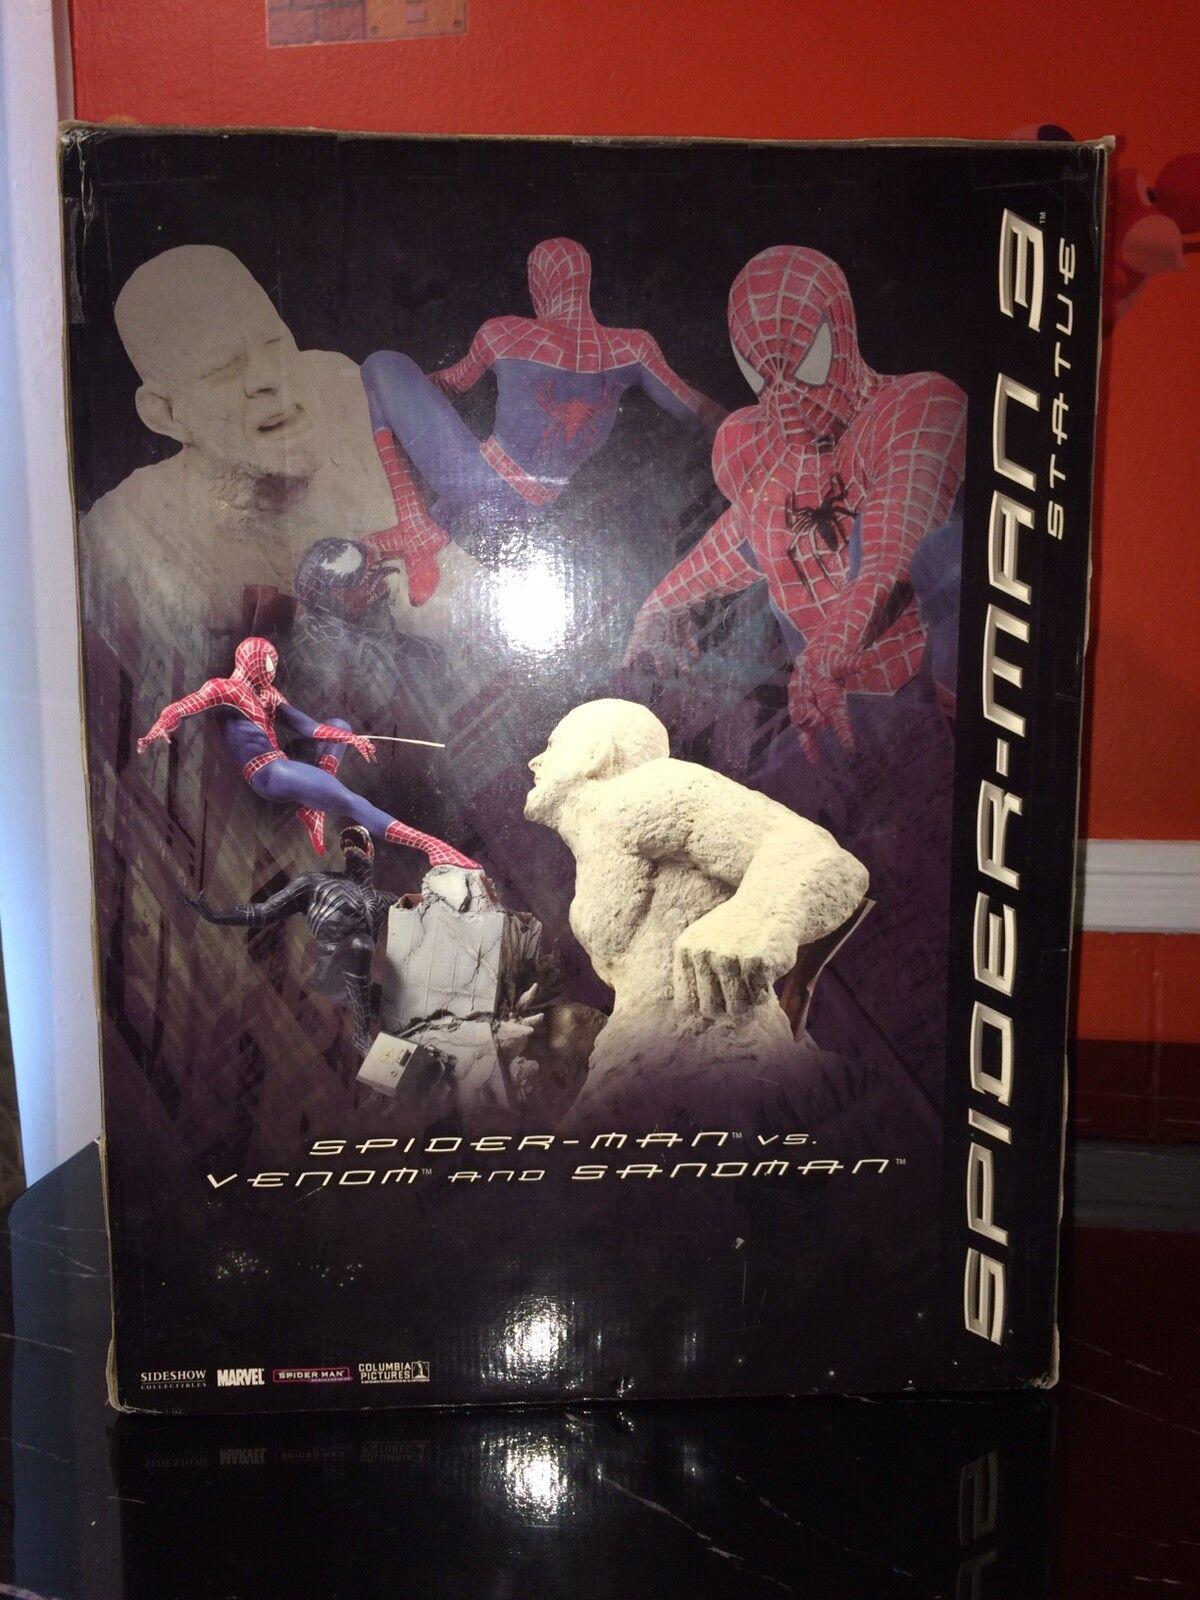 Sideshow  Spiderman Vs Venom And Sandman Diorama Spiderman 3 Statue